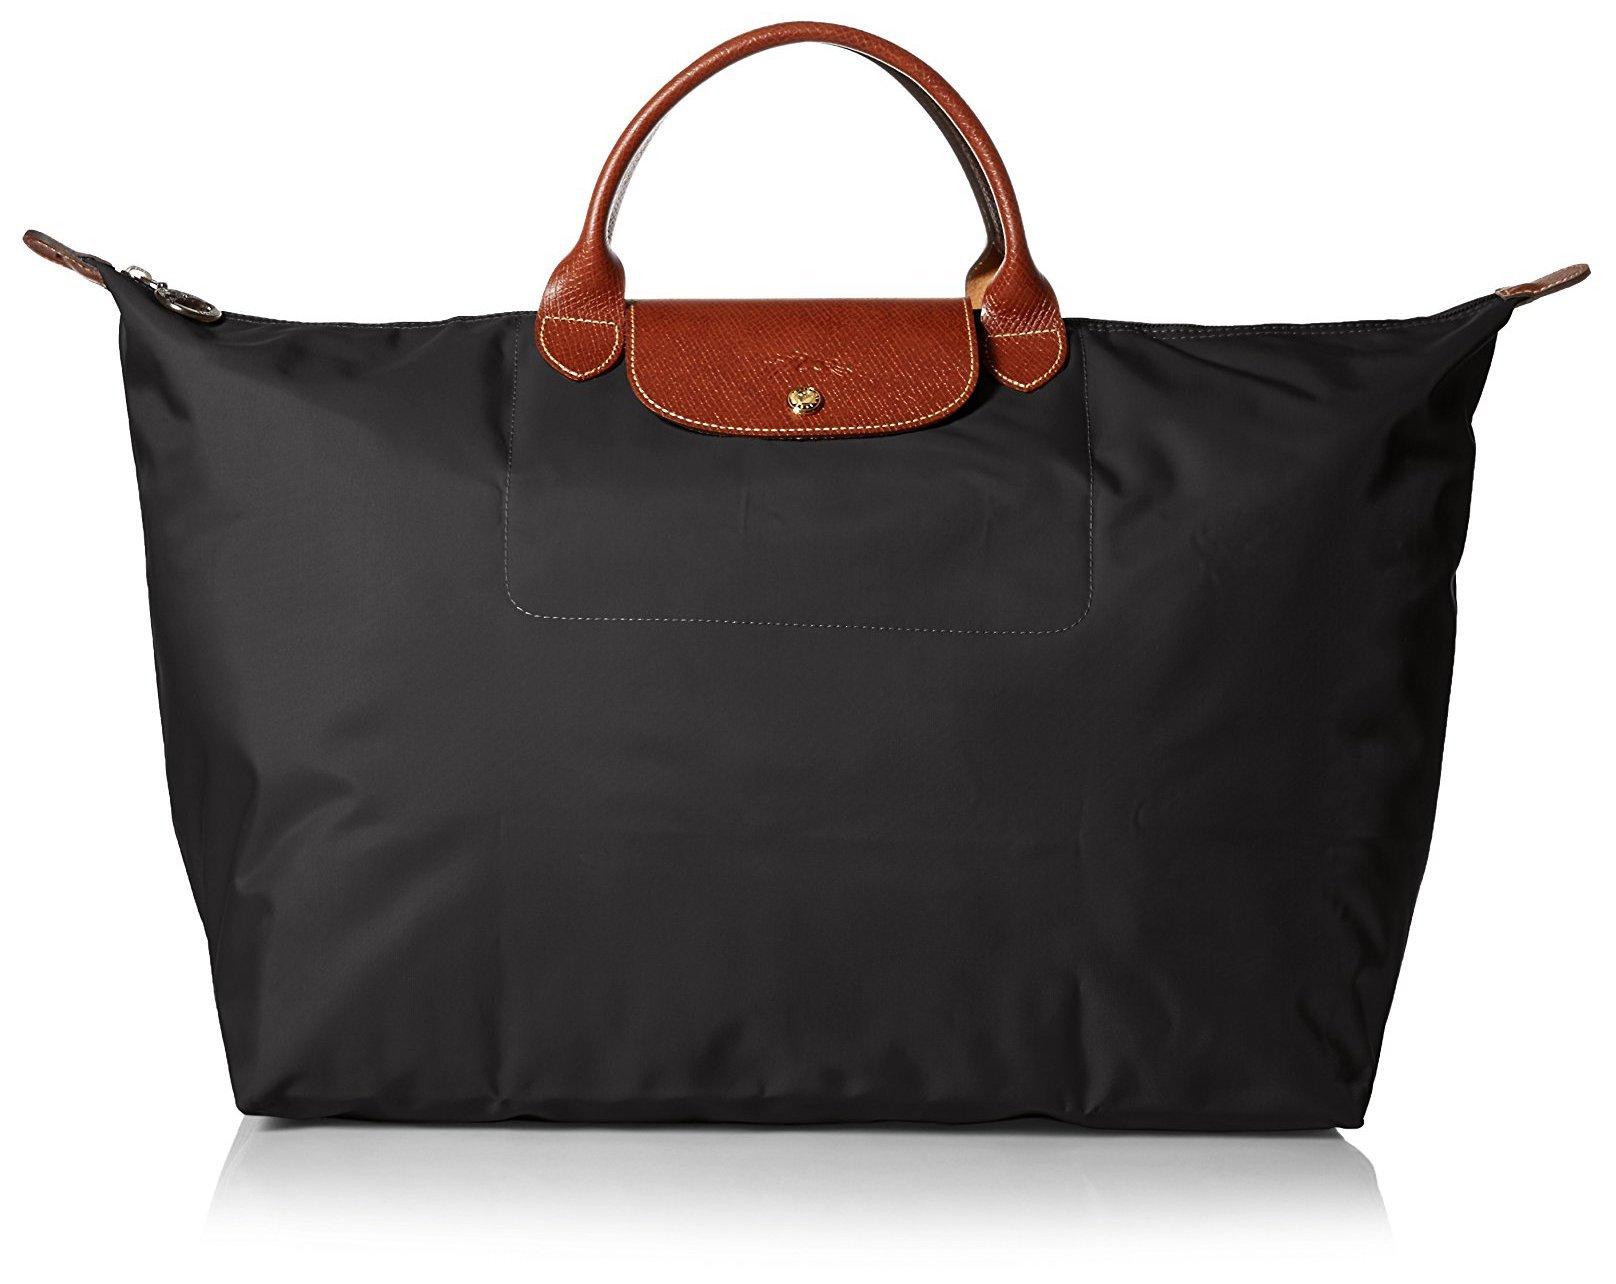 Longchamp Le Pliage Large Travel Bag, Black, 17.75'' x 13.75'' x 9''